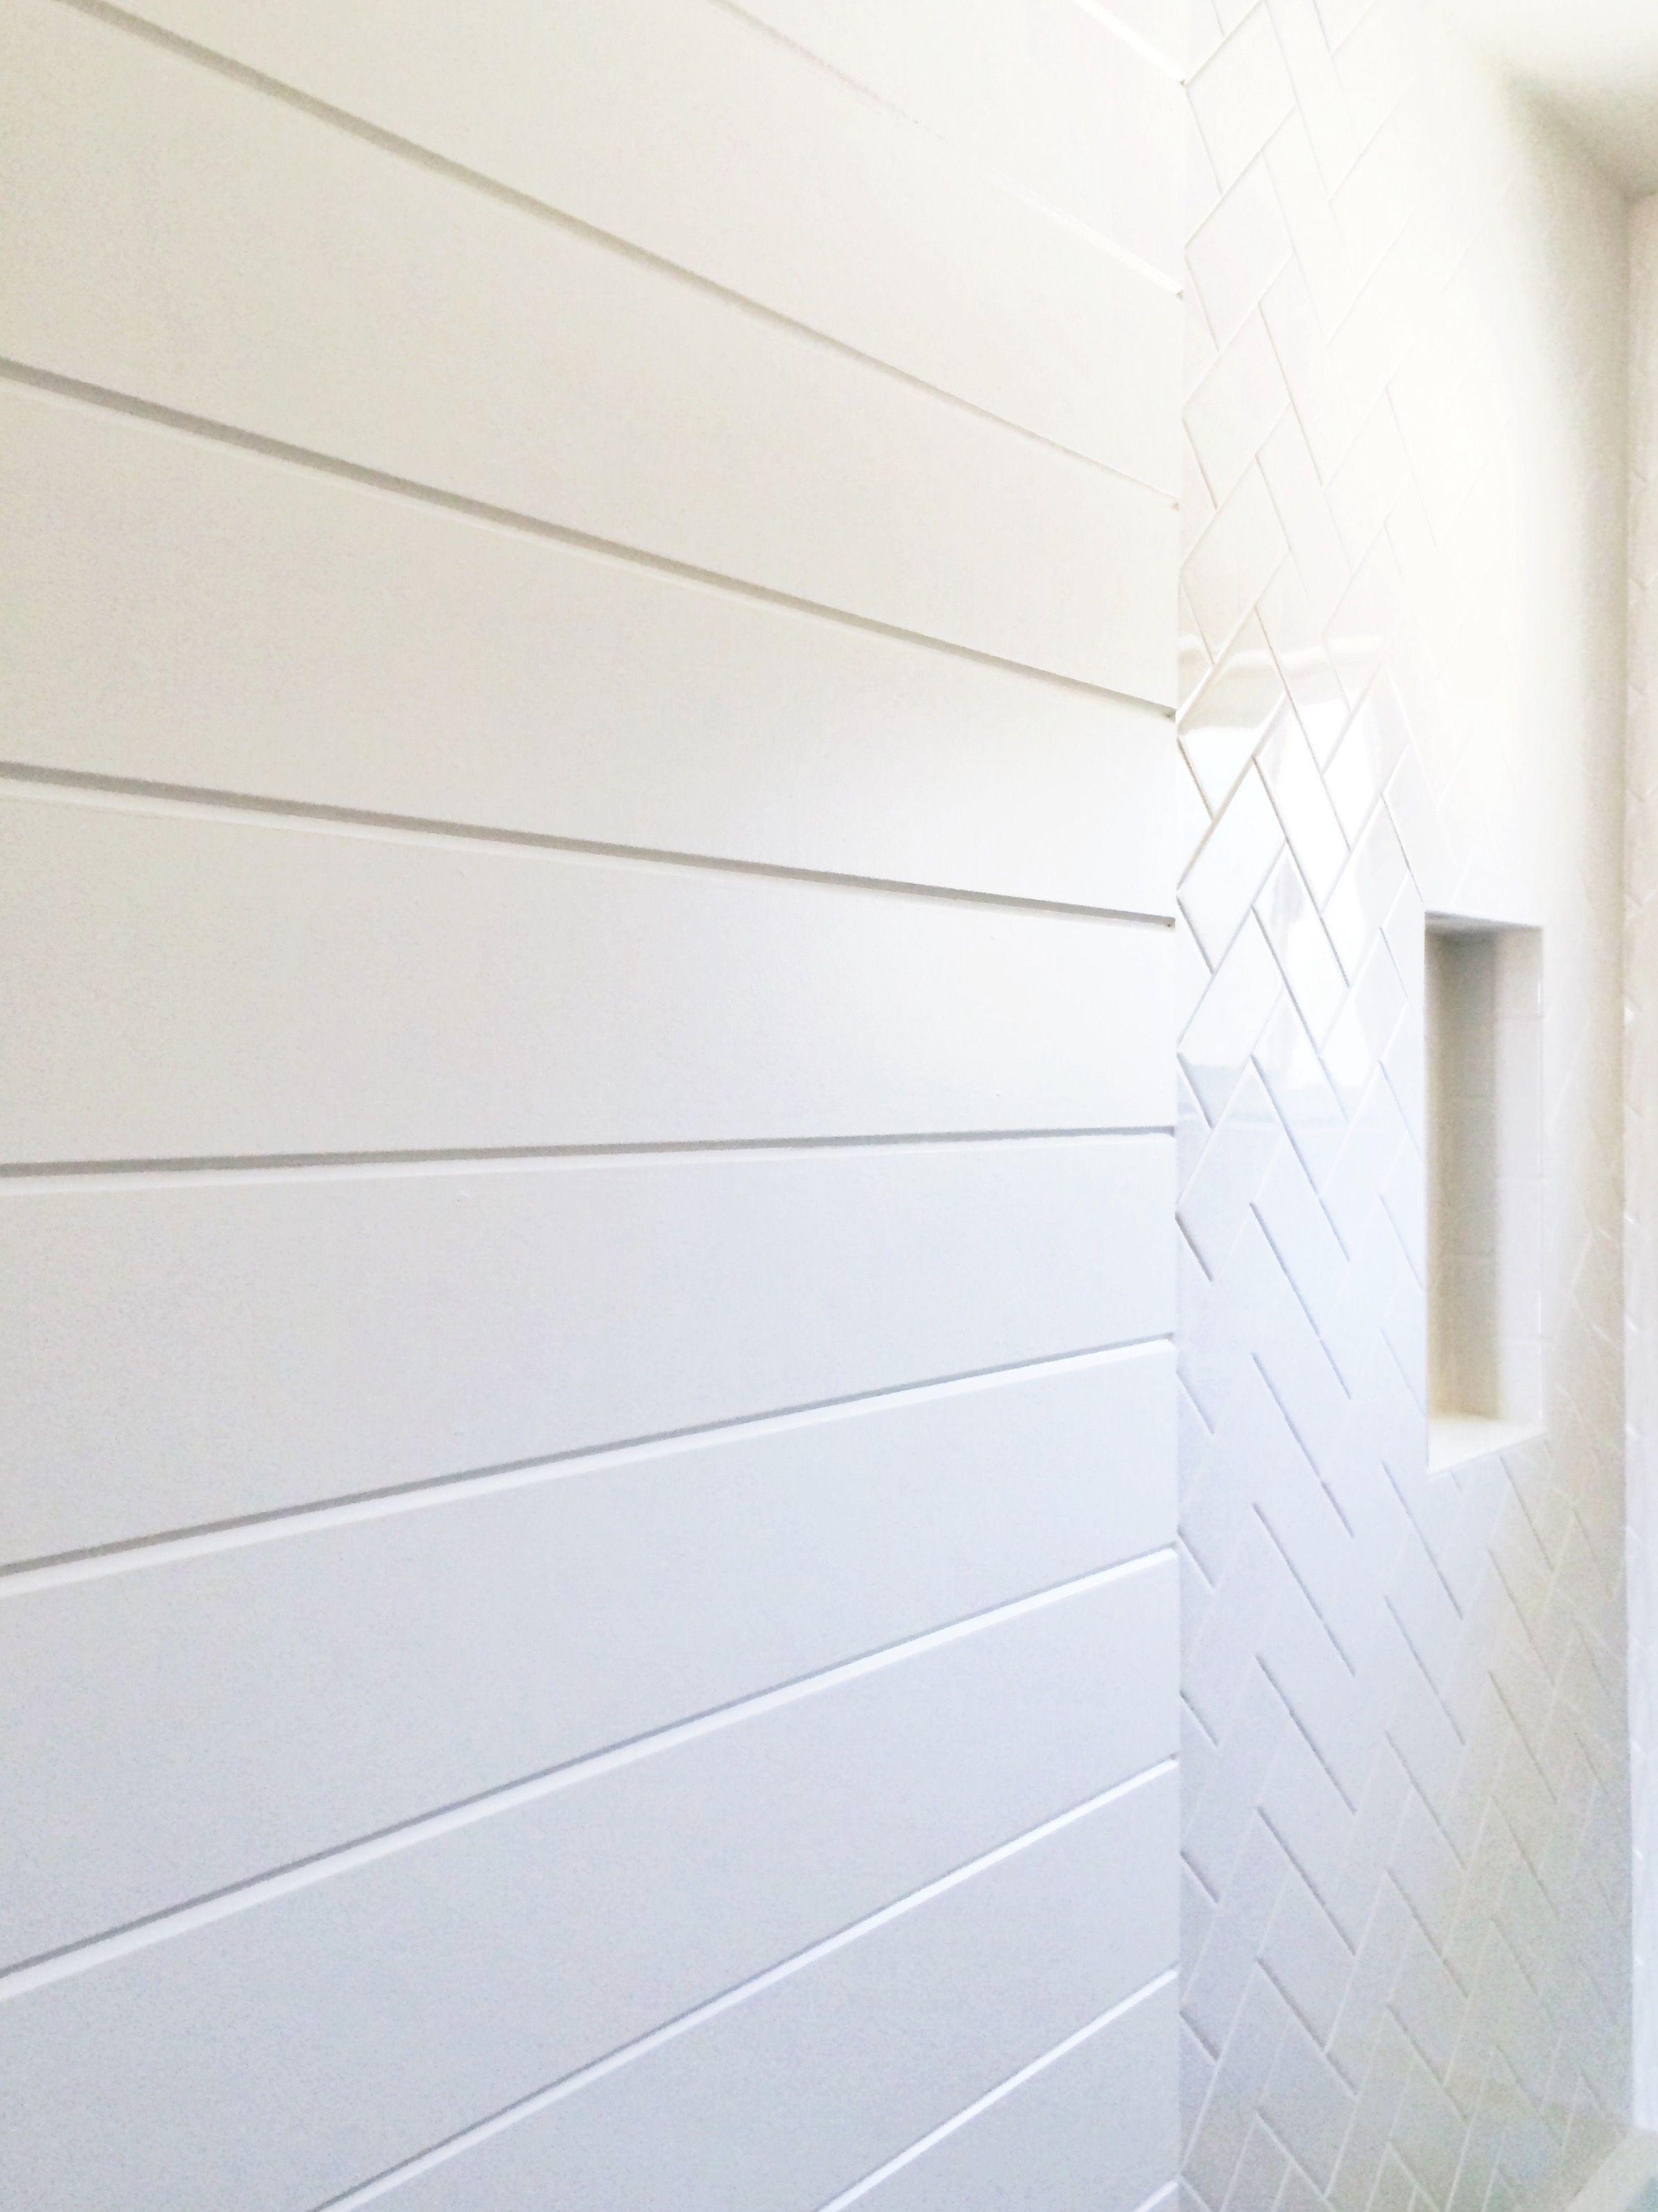 Super Tile That Looks Like Shiplap